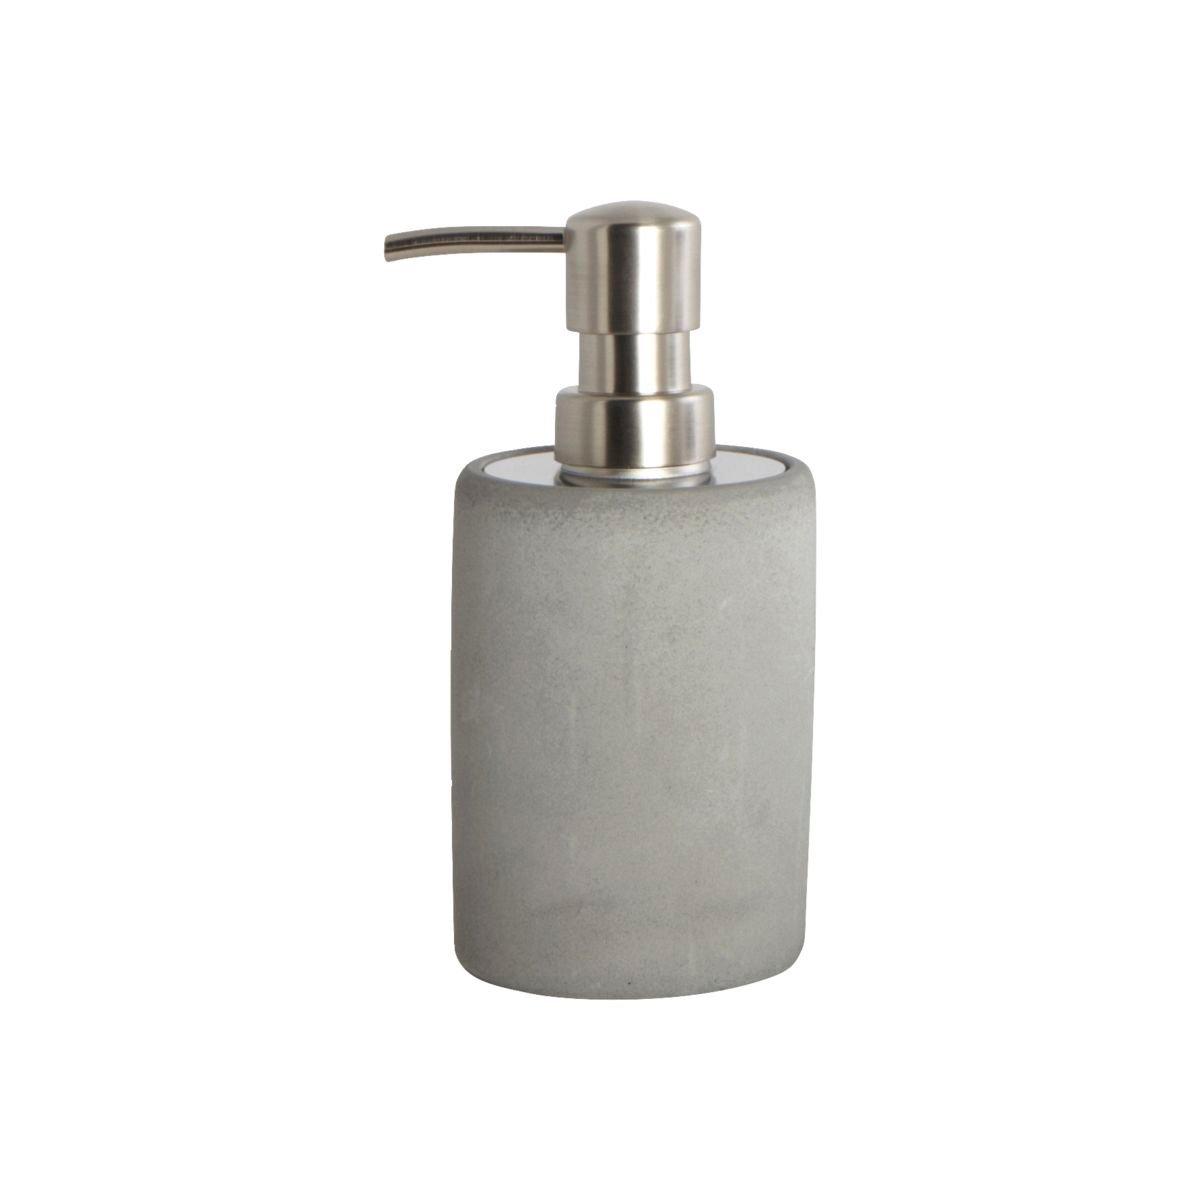 House Doctor - Cement Soap Dispenser (Tj0100)